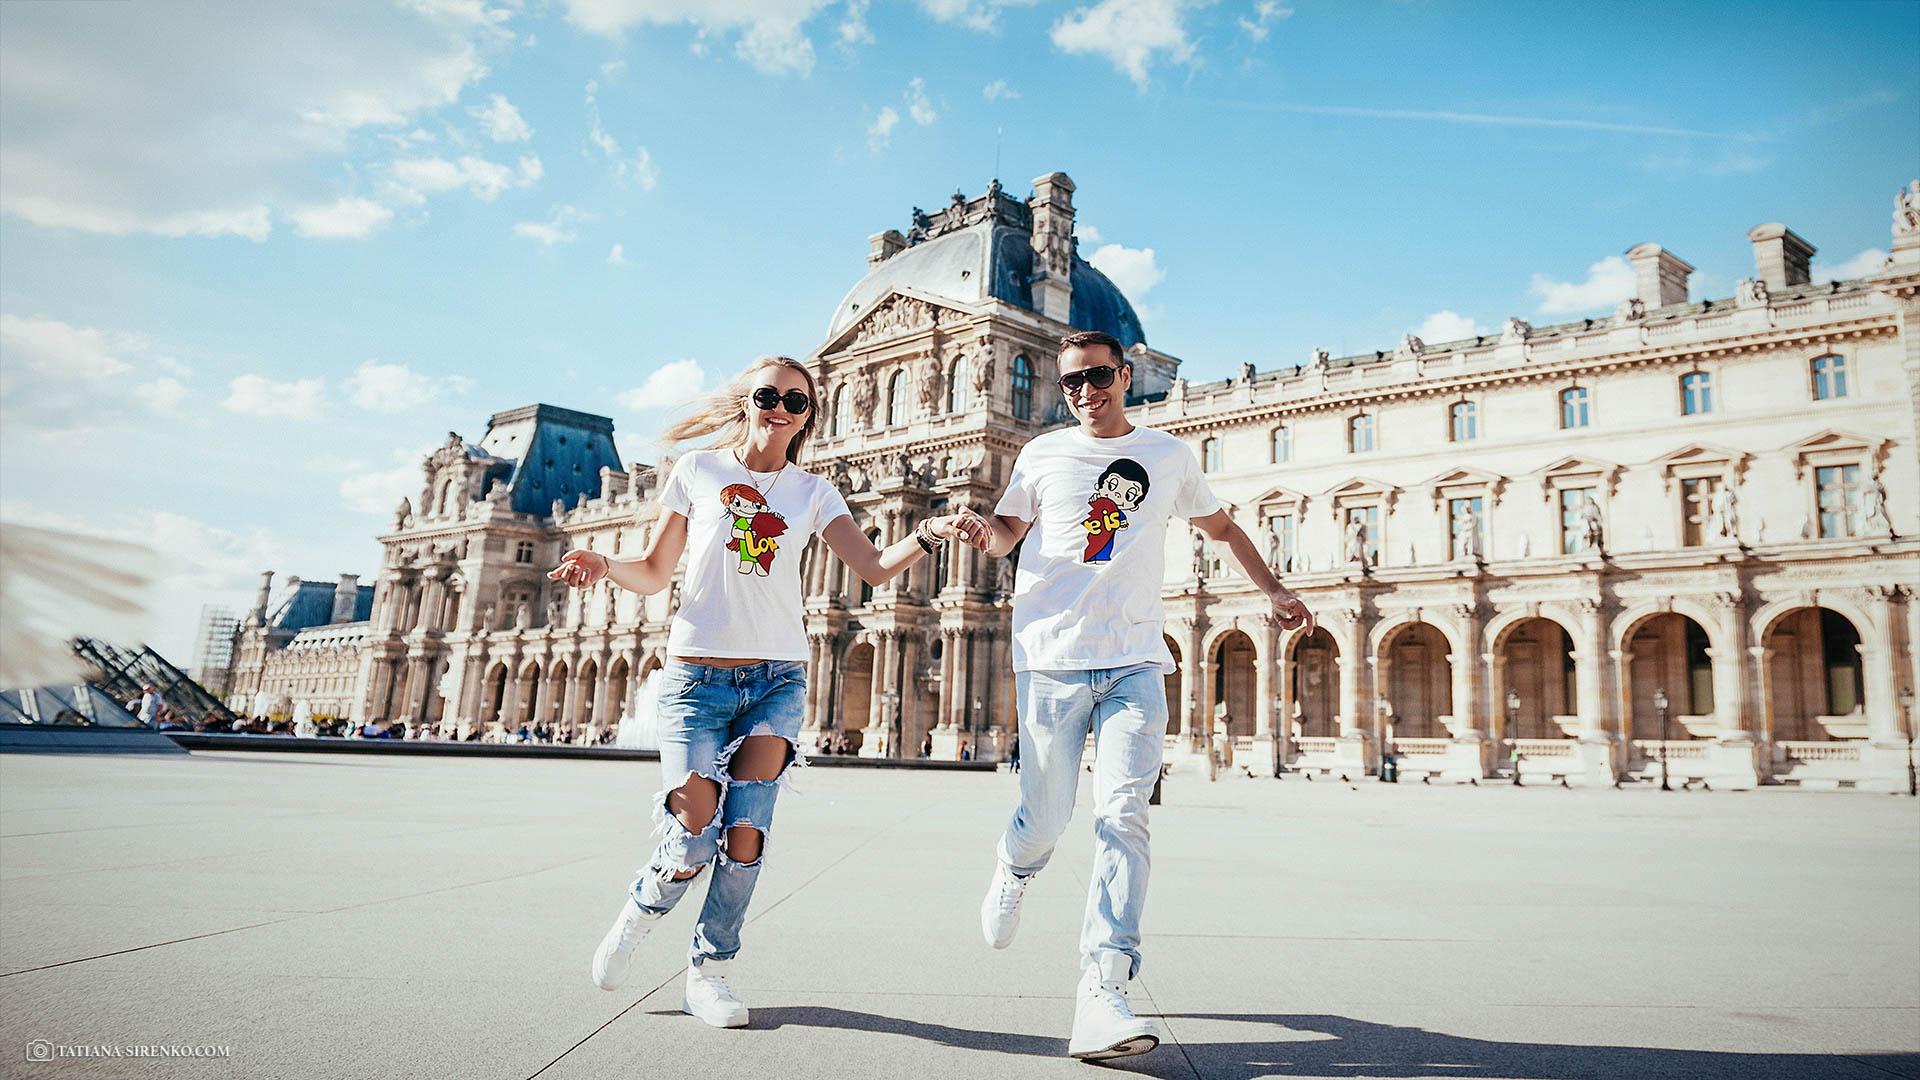 Photoshoot Love Story in Paris